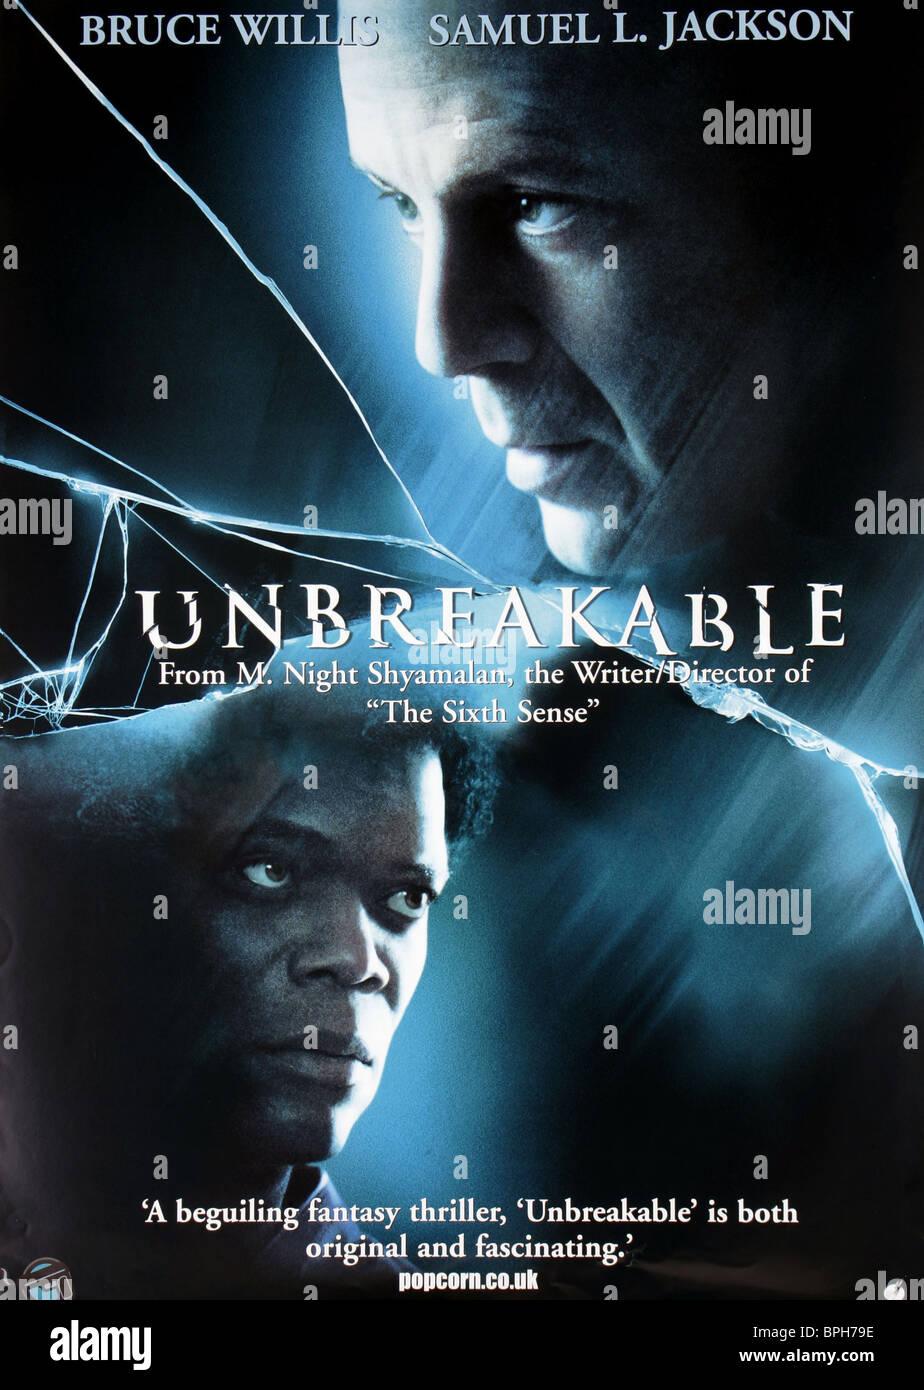 Samuel L Jackson & Bruce Willis Poster Unbreakable (2000